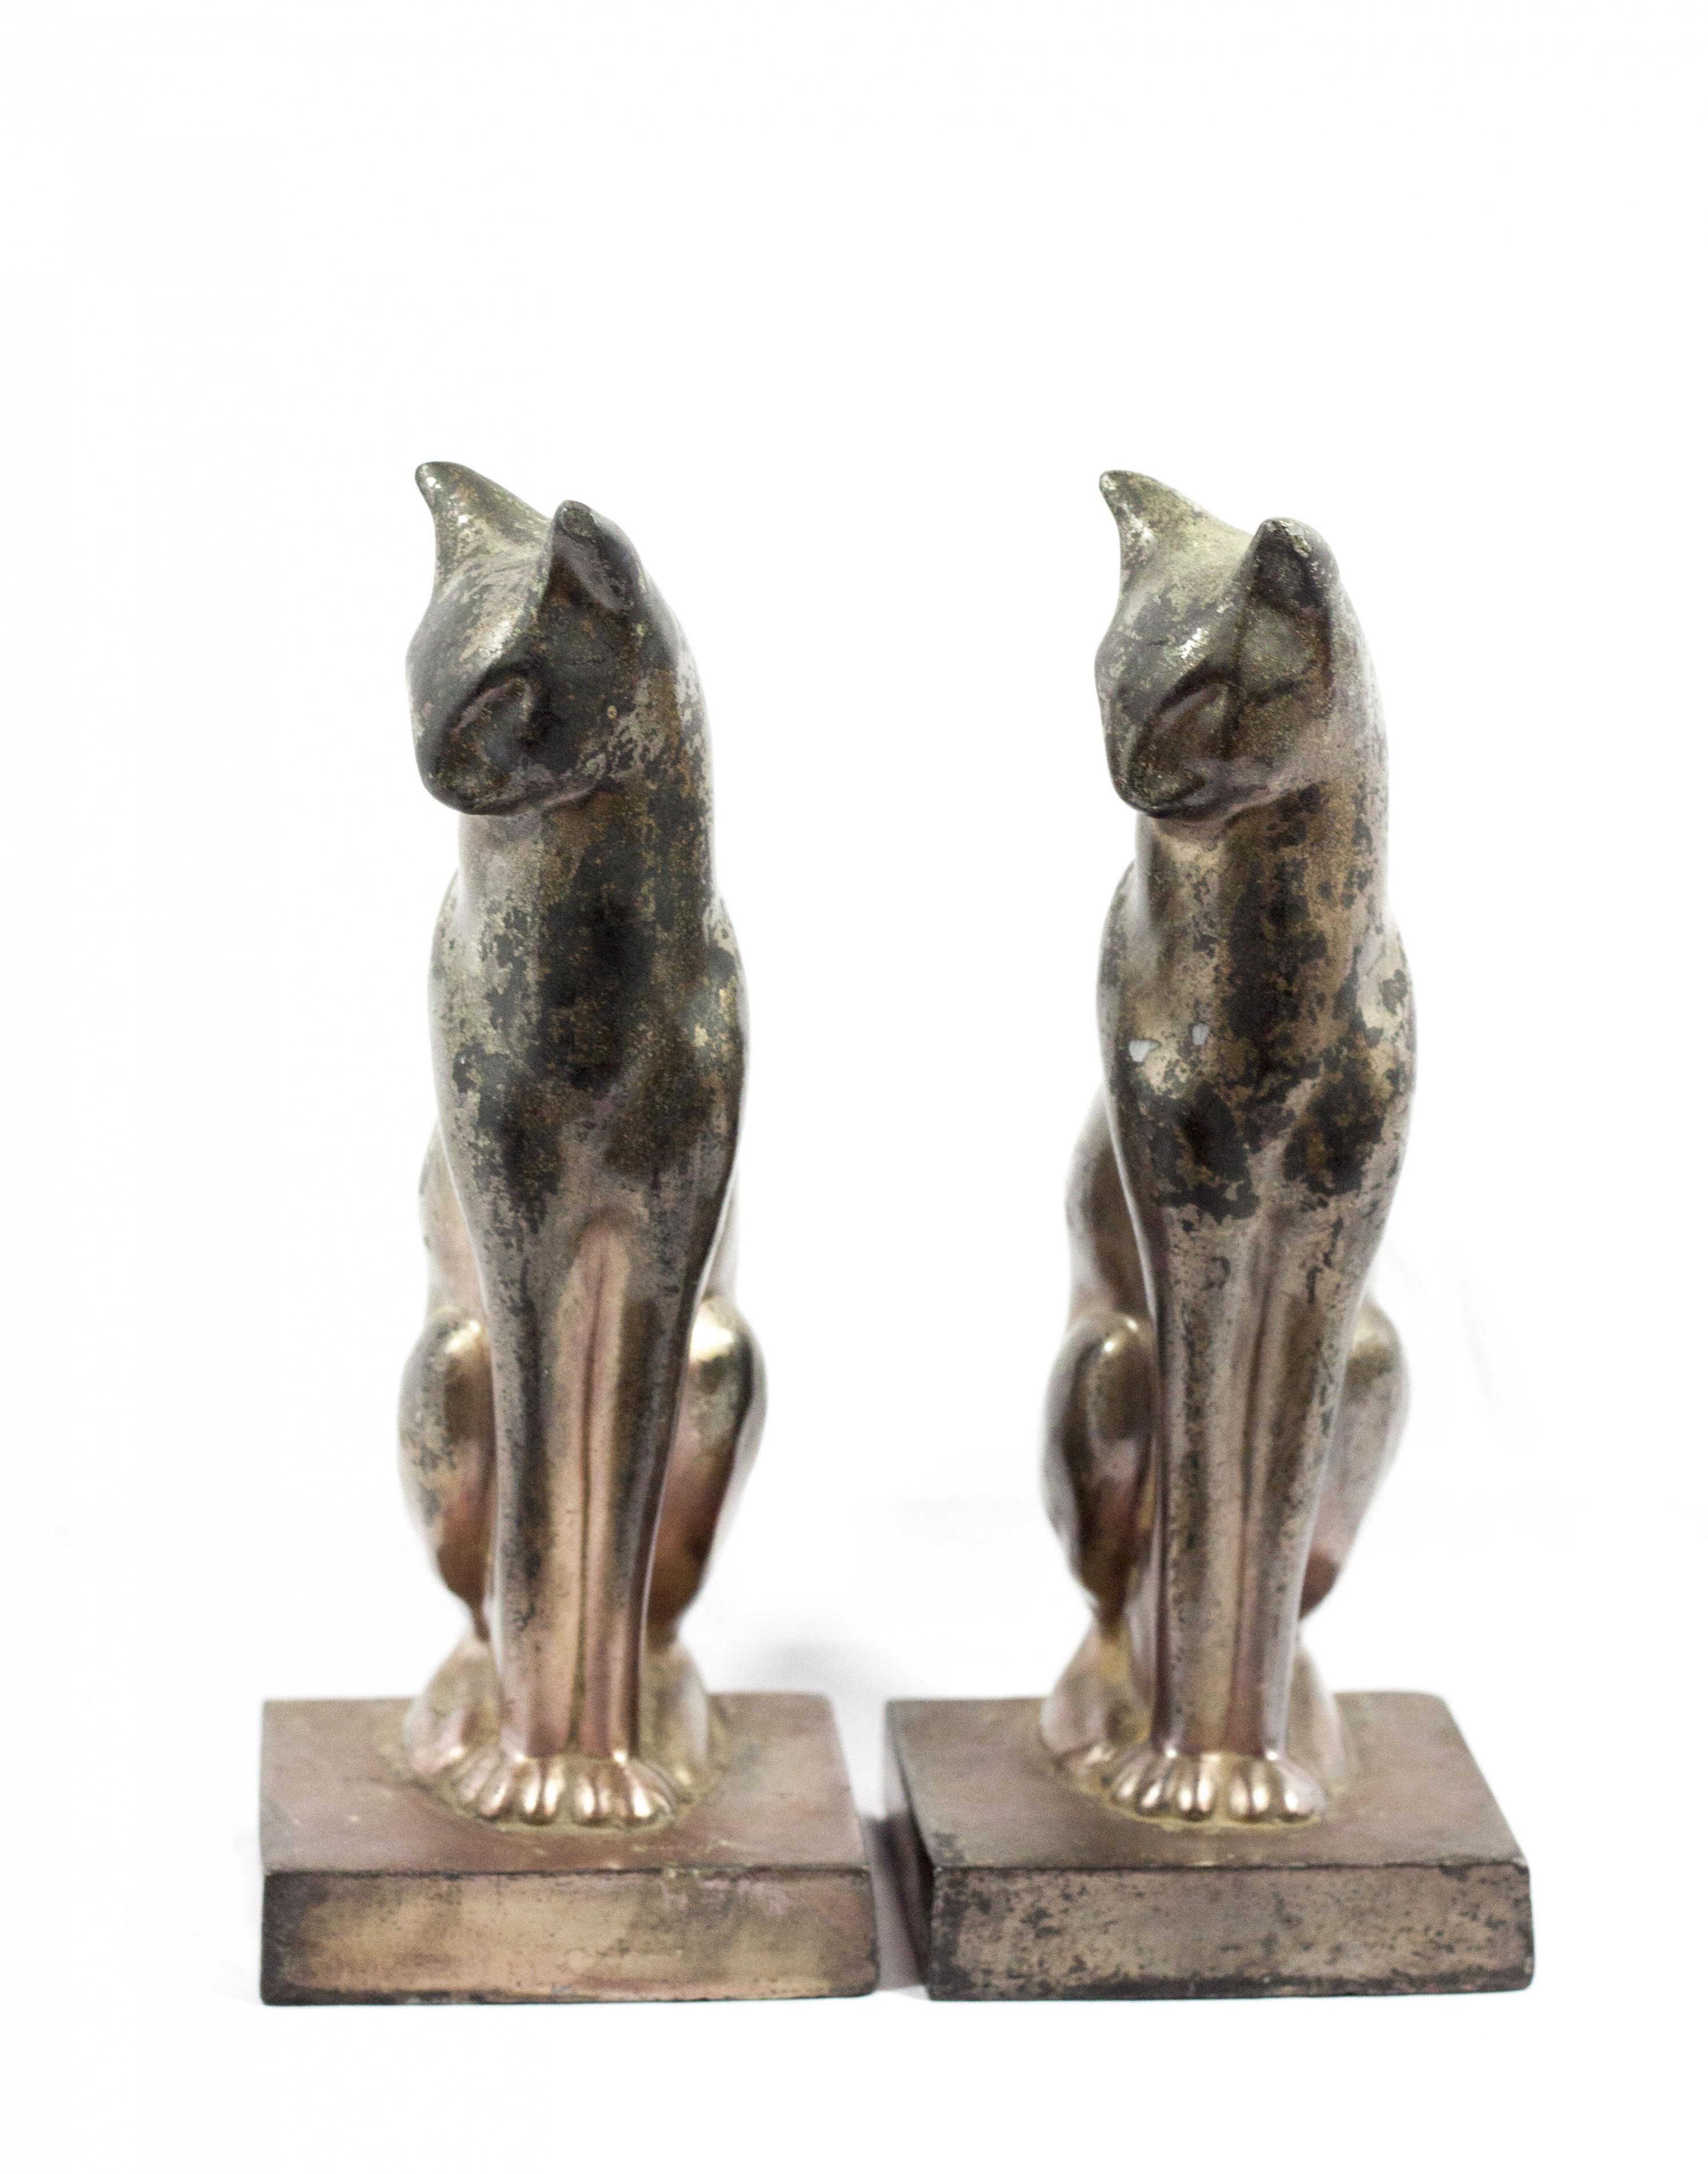 Vintage Art Deco Style Cat Bookends Modernism